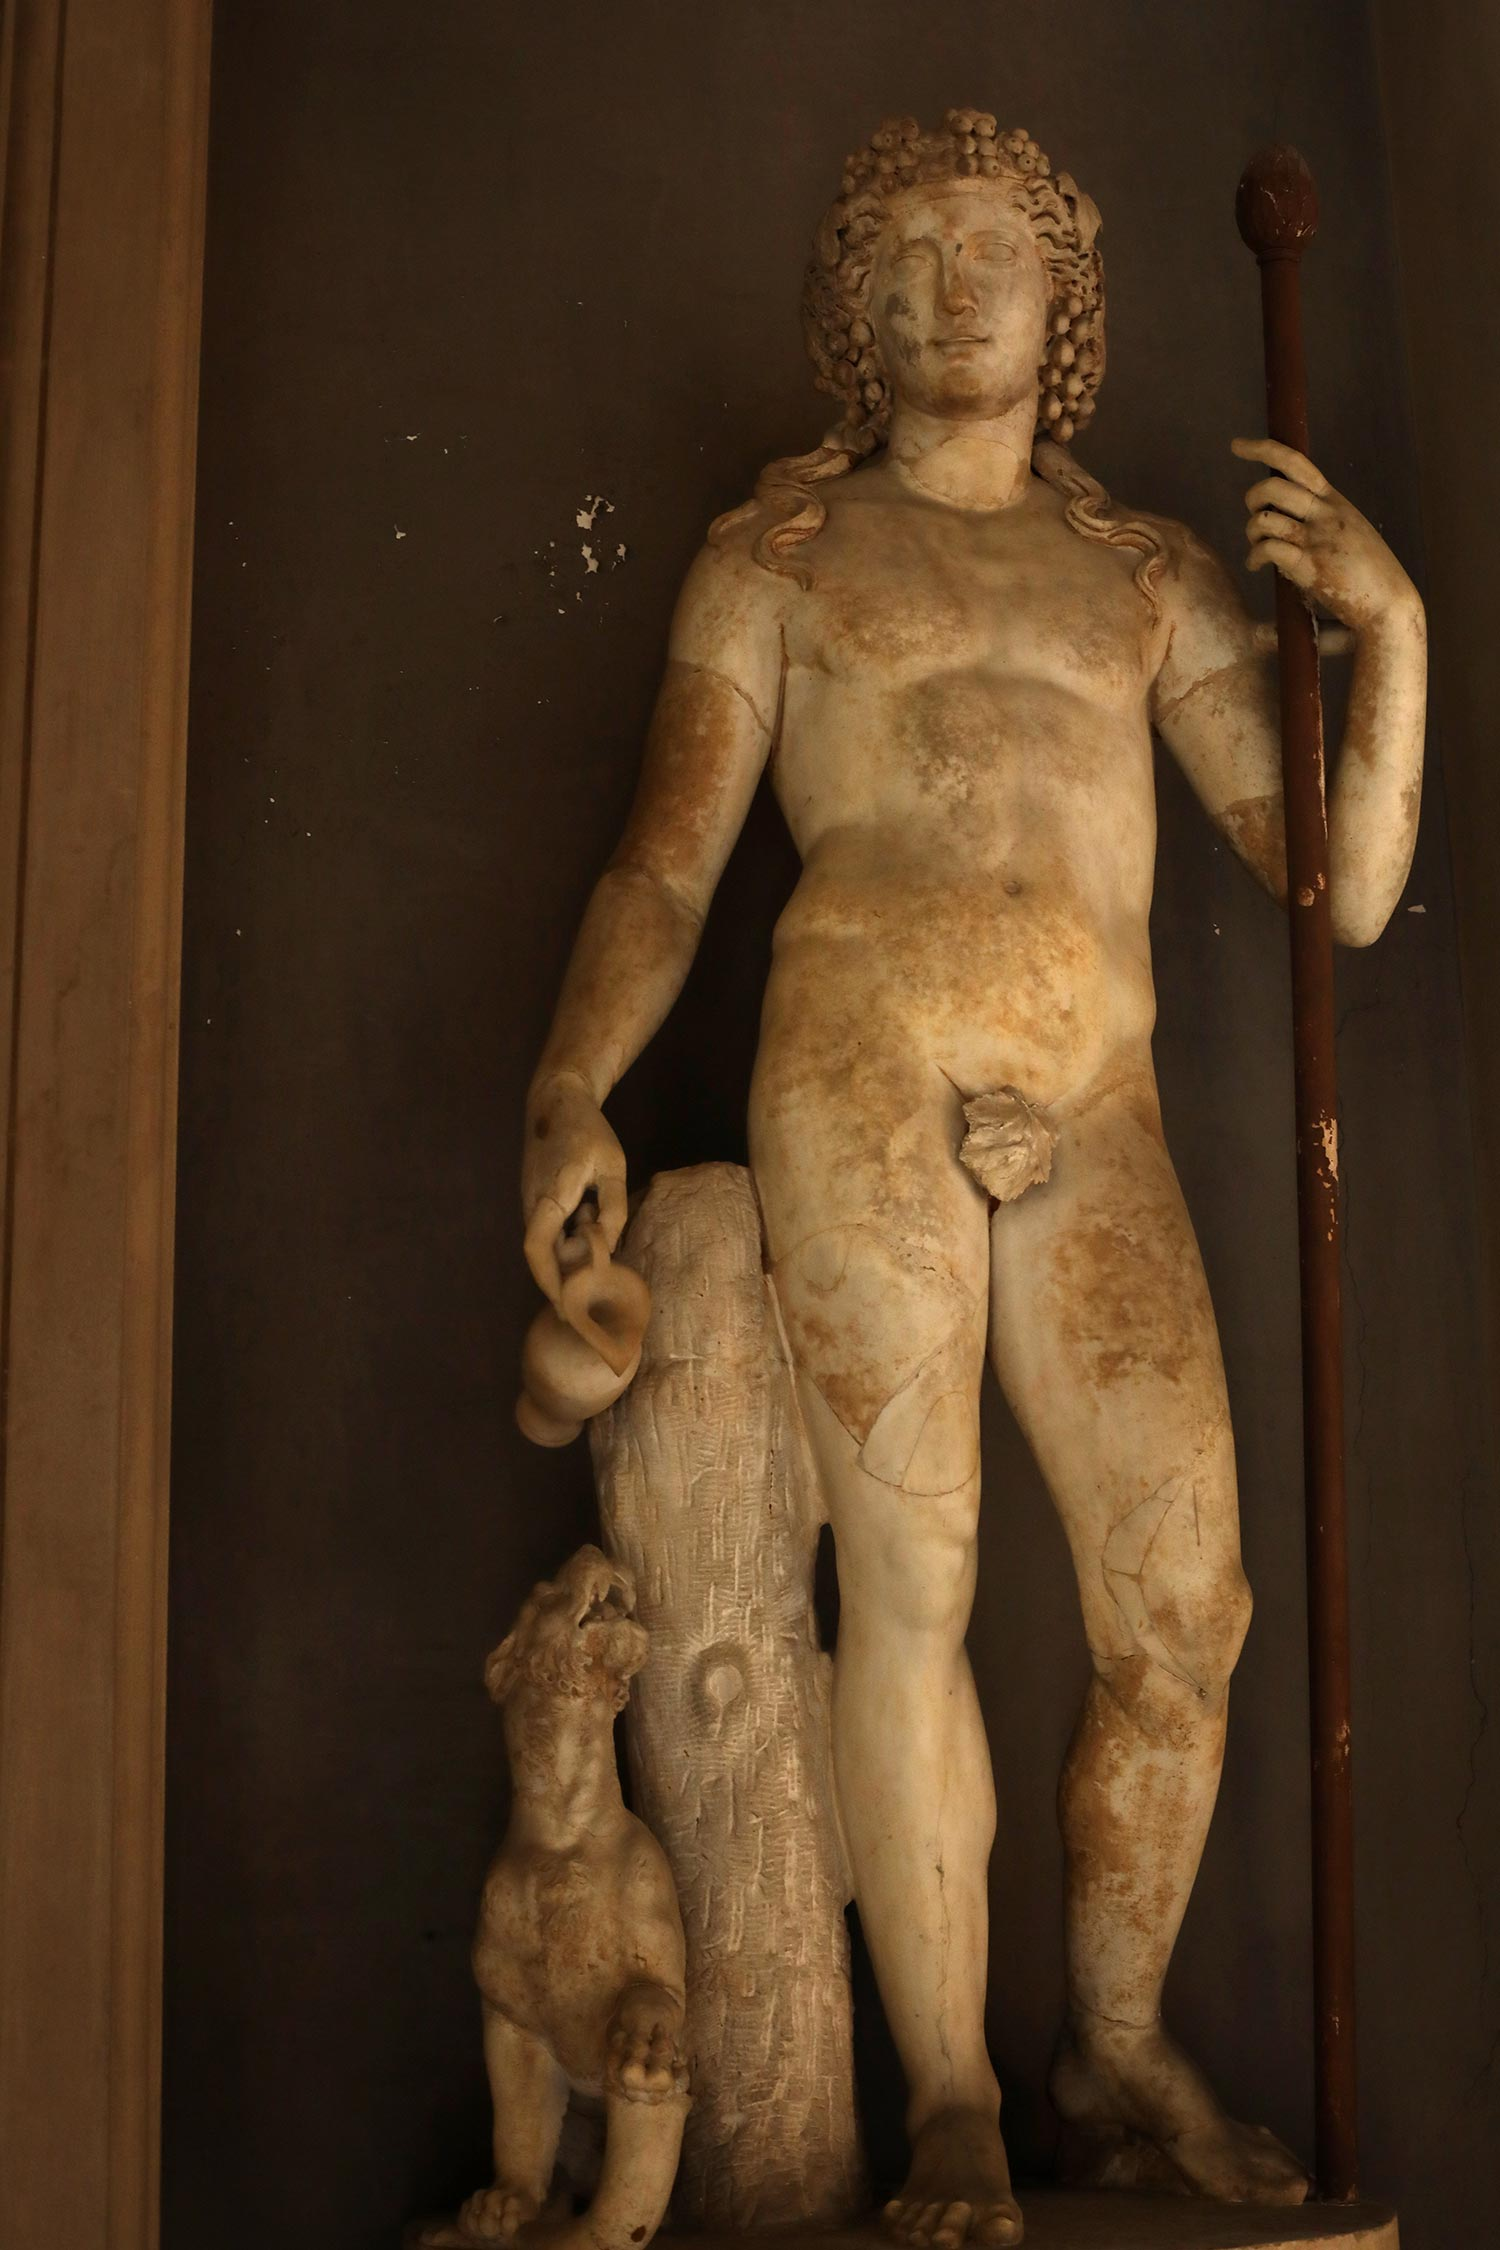 Pilgrimage_Rome_3354_VaticanMu.jpg